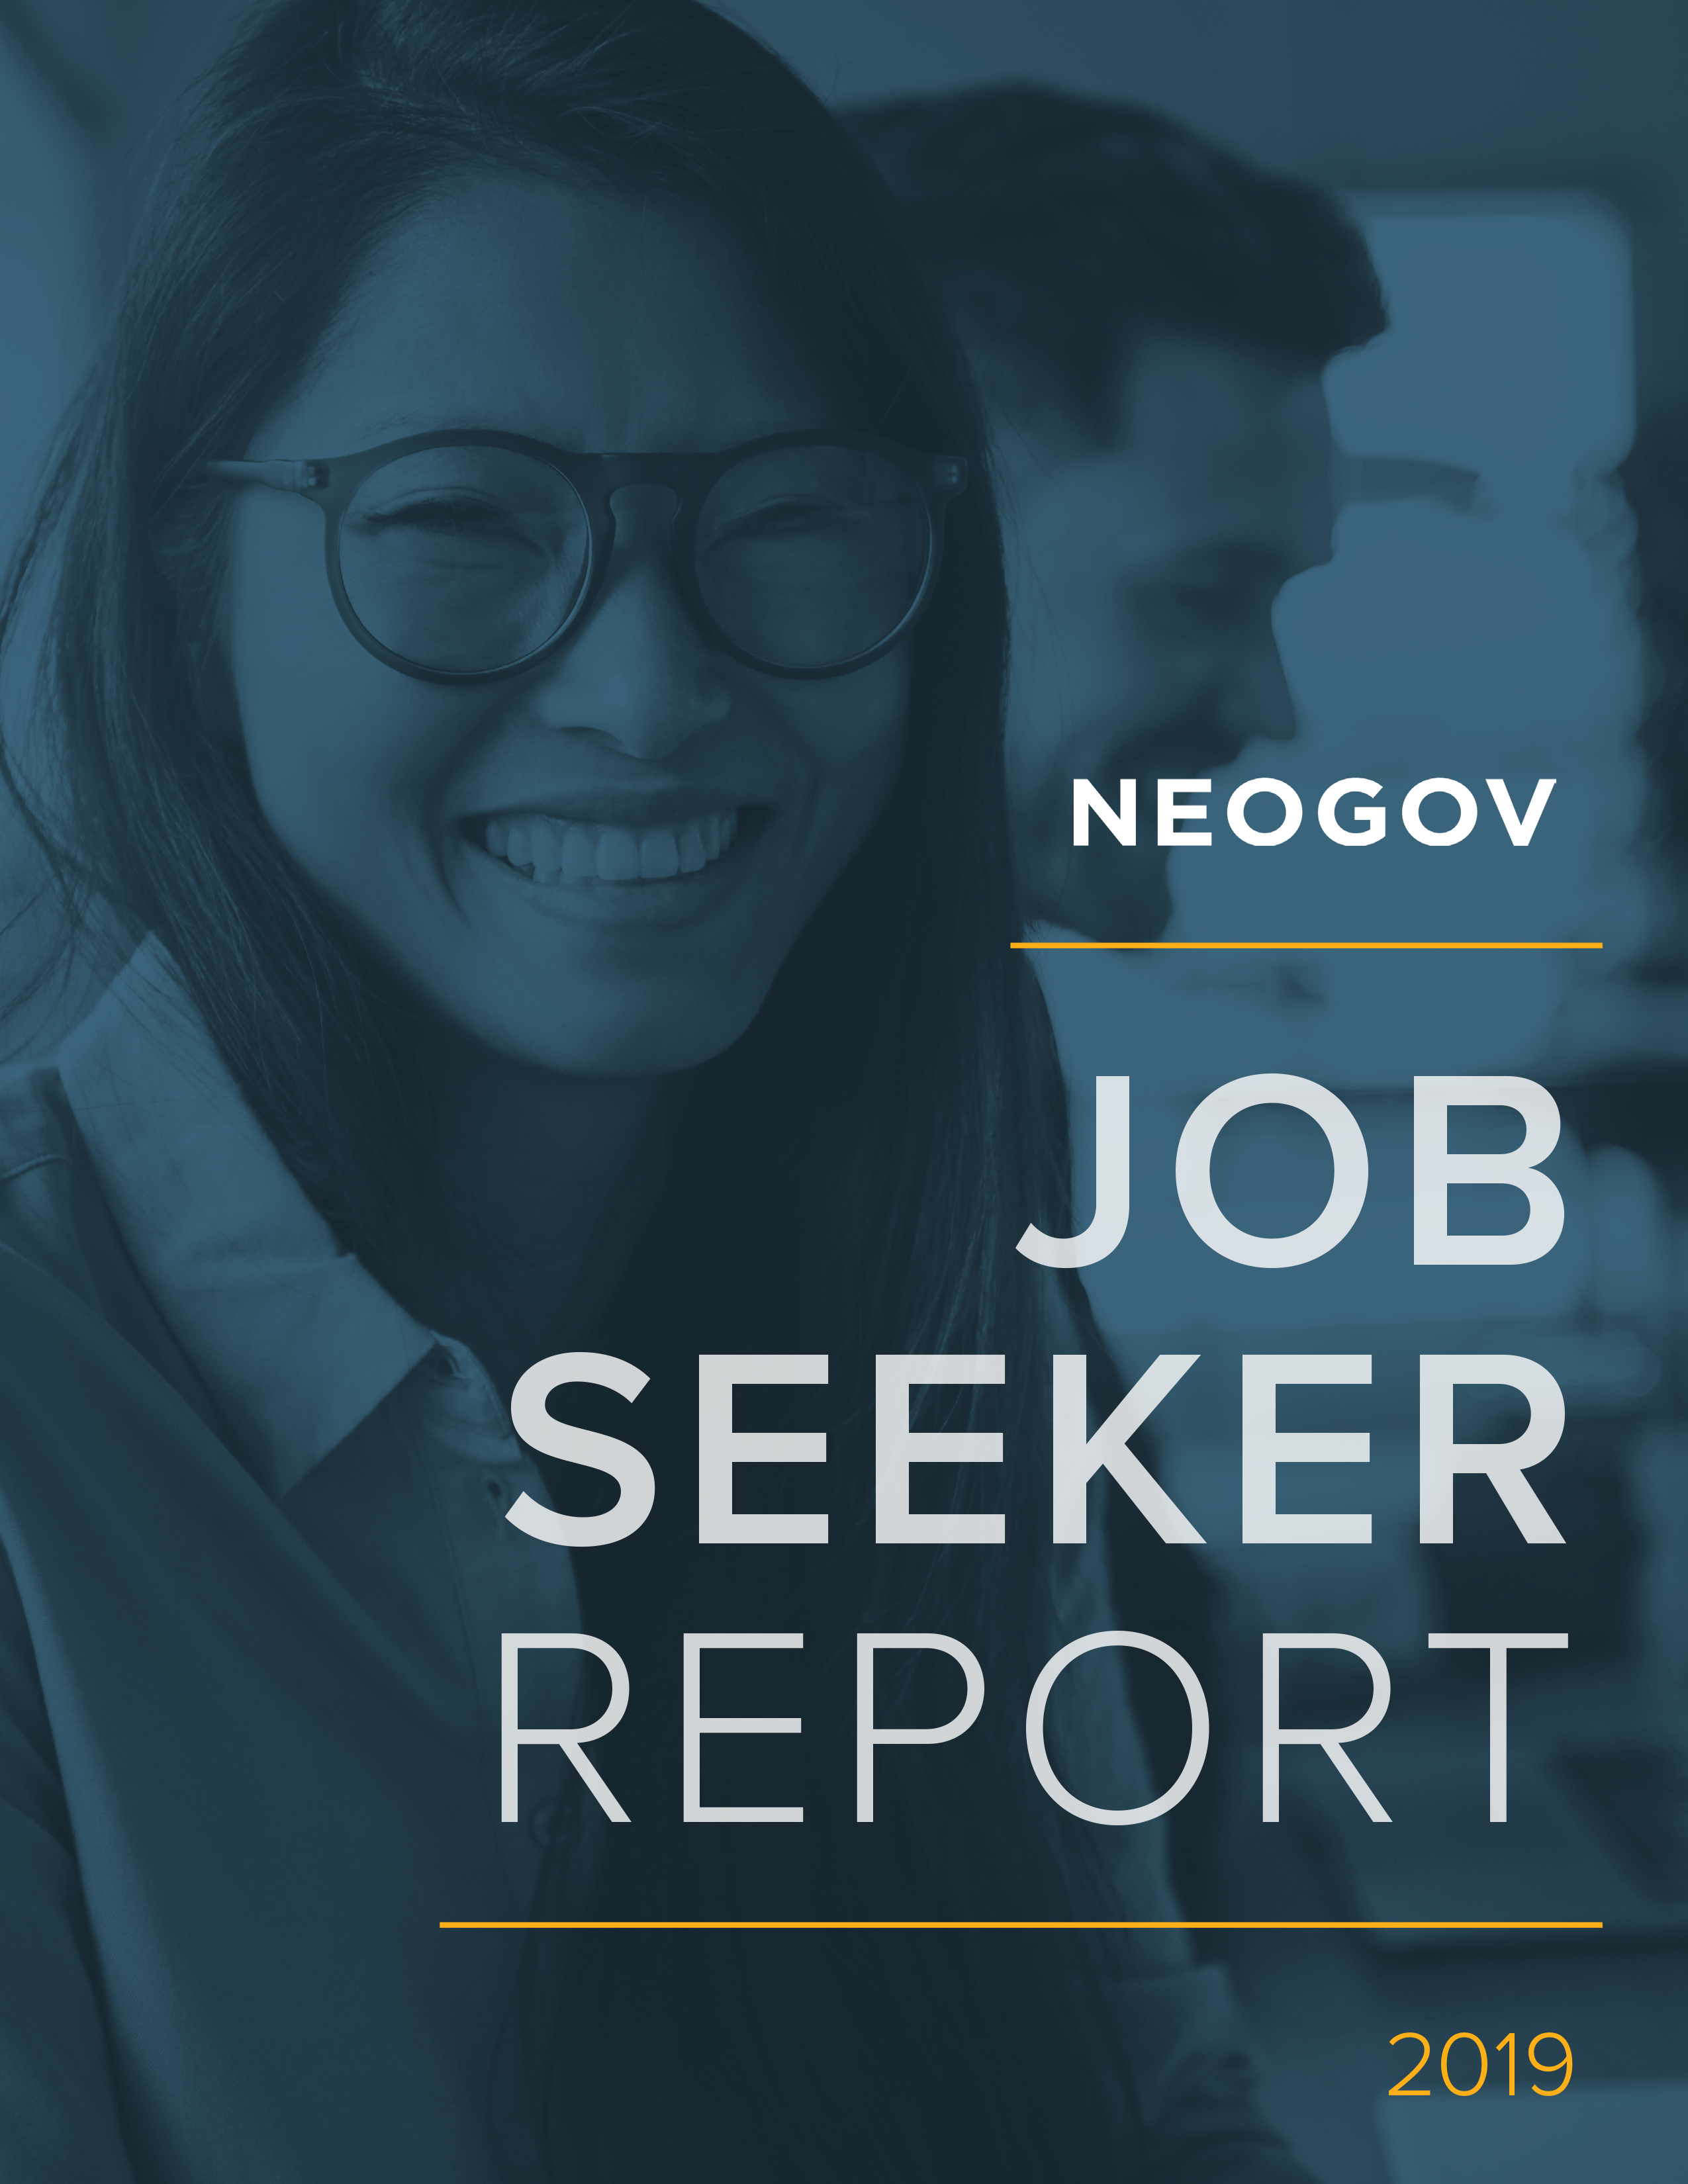 JobSeekerReportLarge